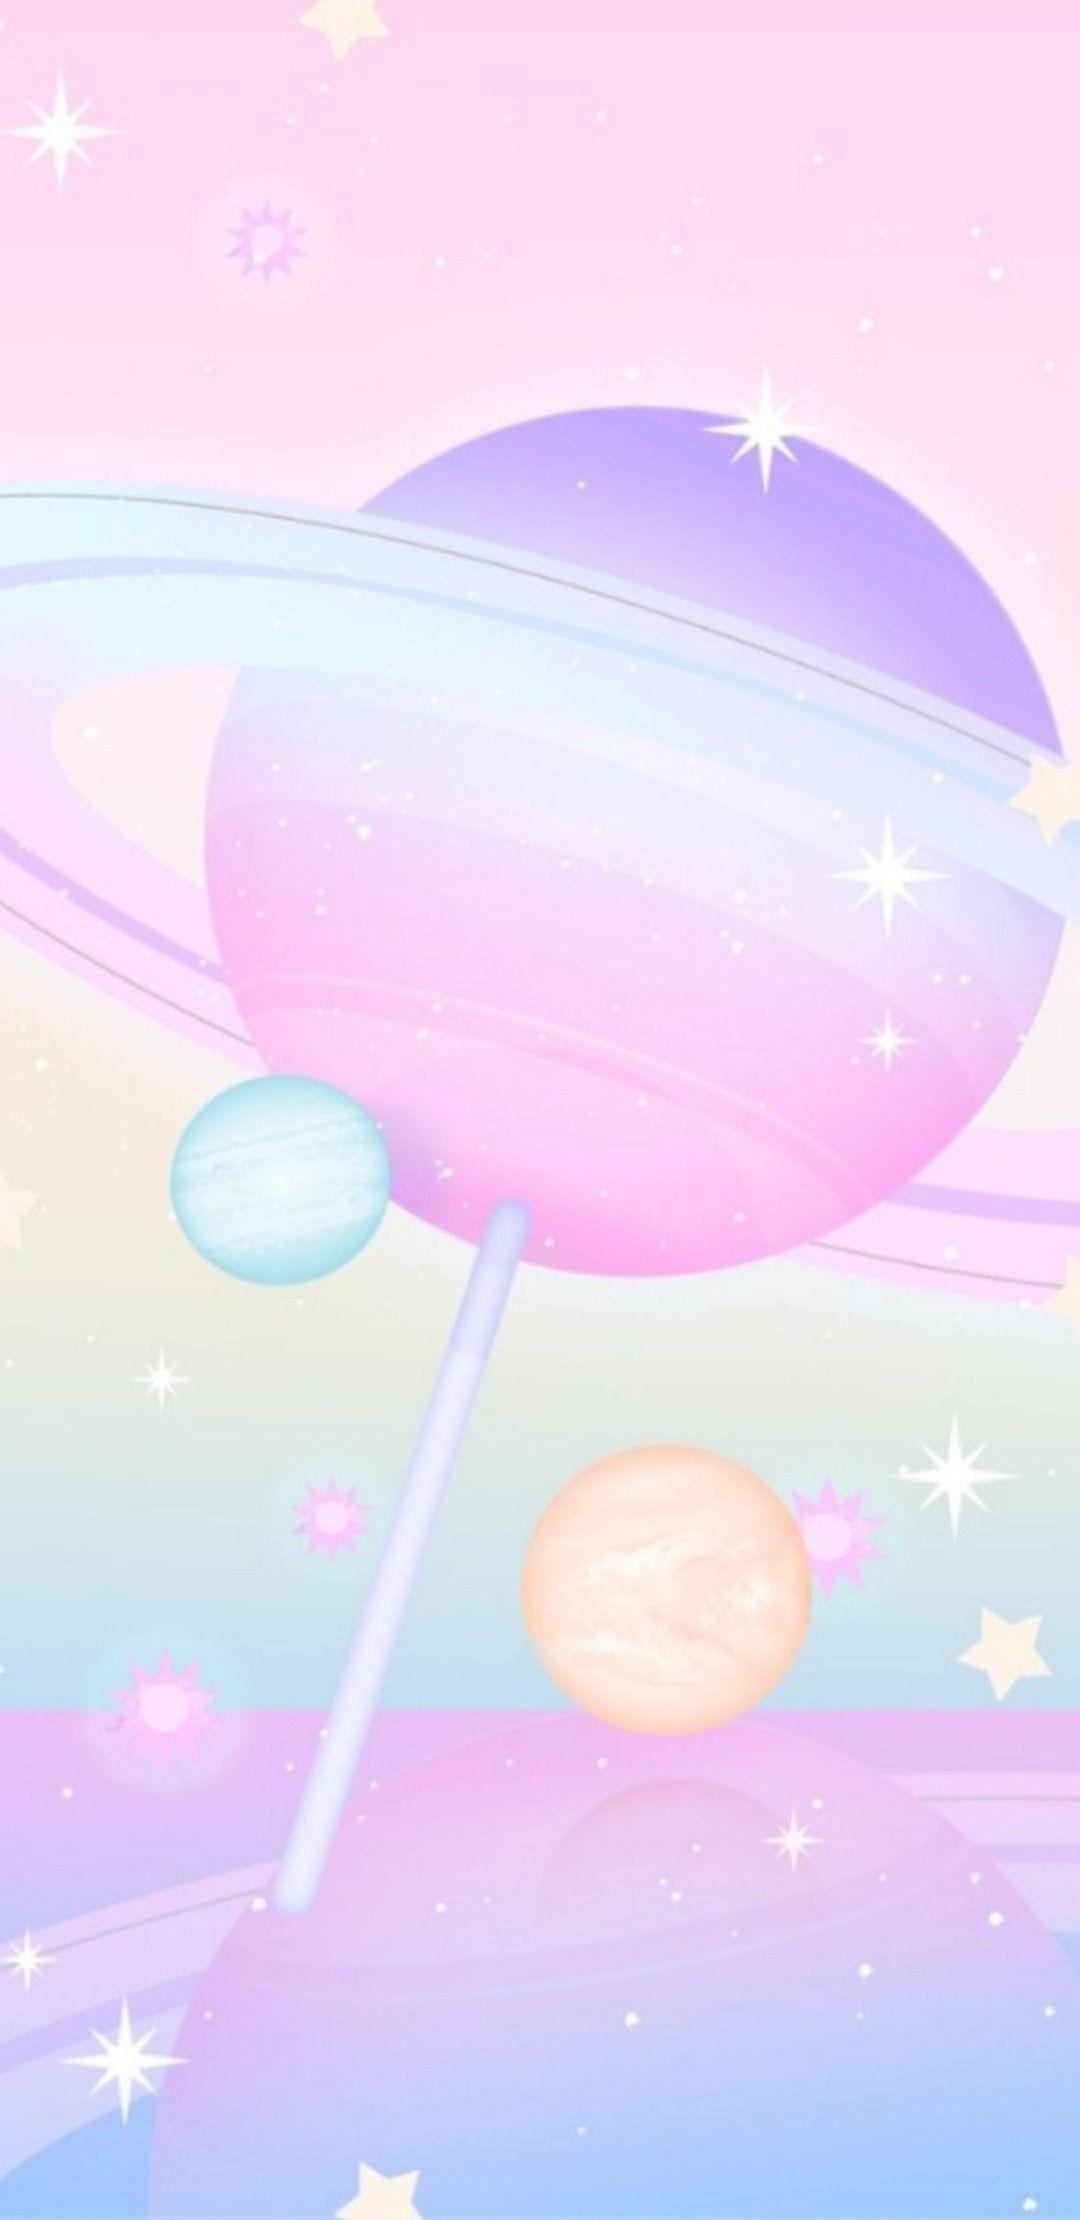 Iejekalenjaivabskaks Space Phone Wallpaper Backgrounds Phone